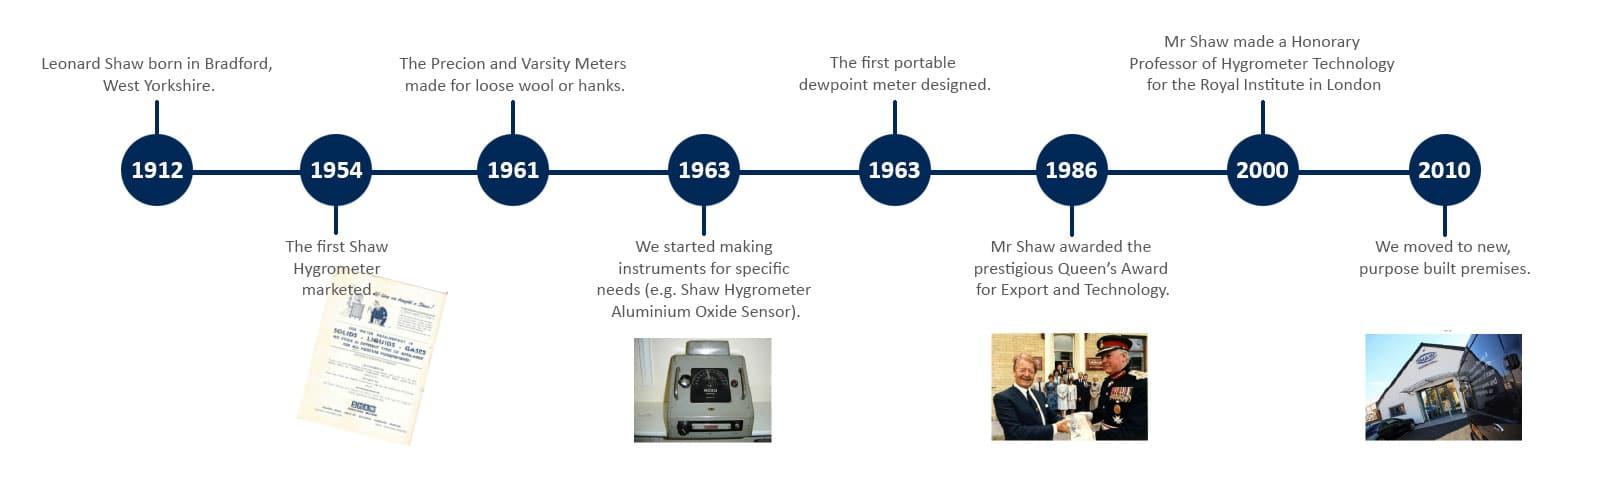 Shaw Moisture Meters history timeline